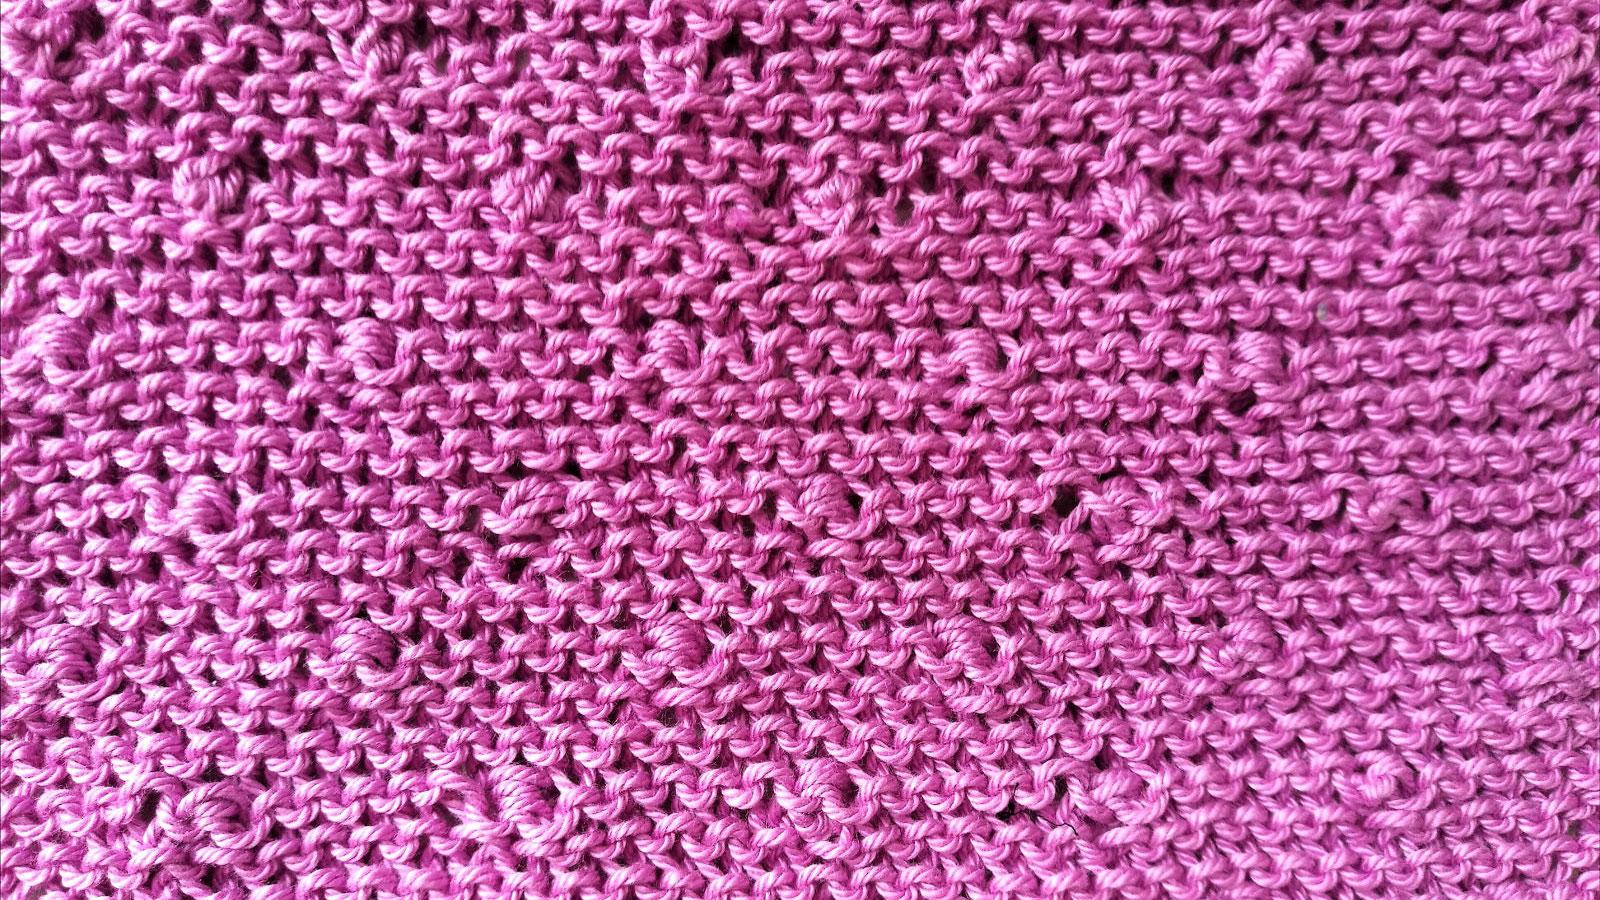 Stitcharium Popcorn Stitch